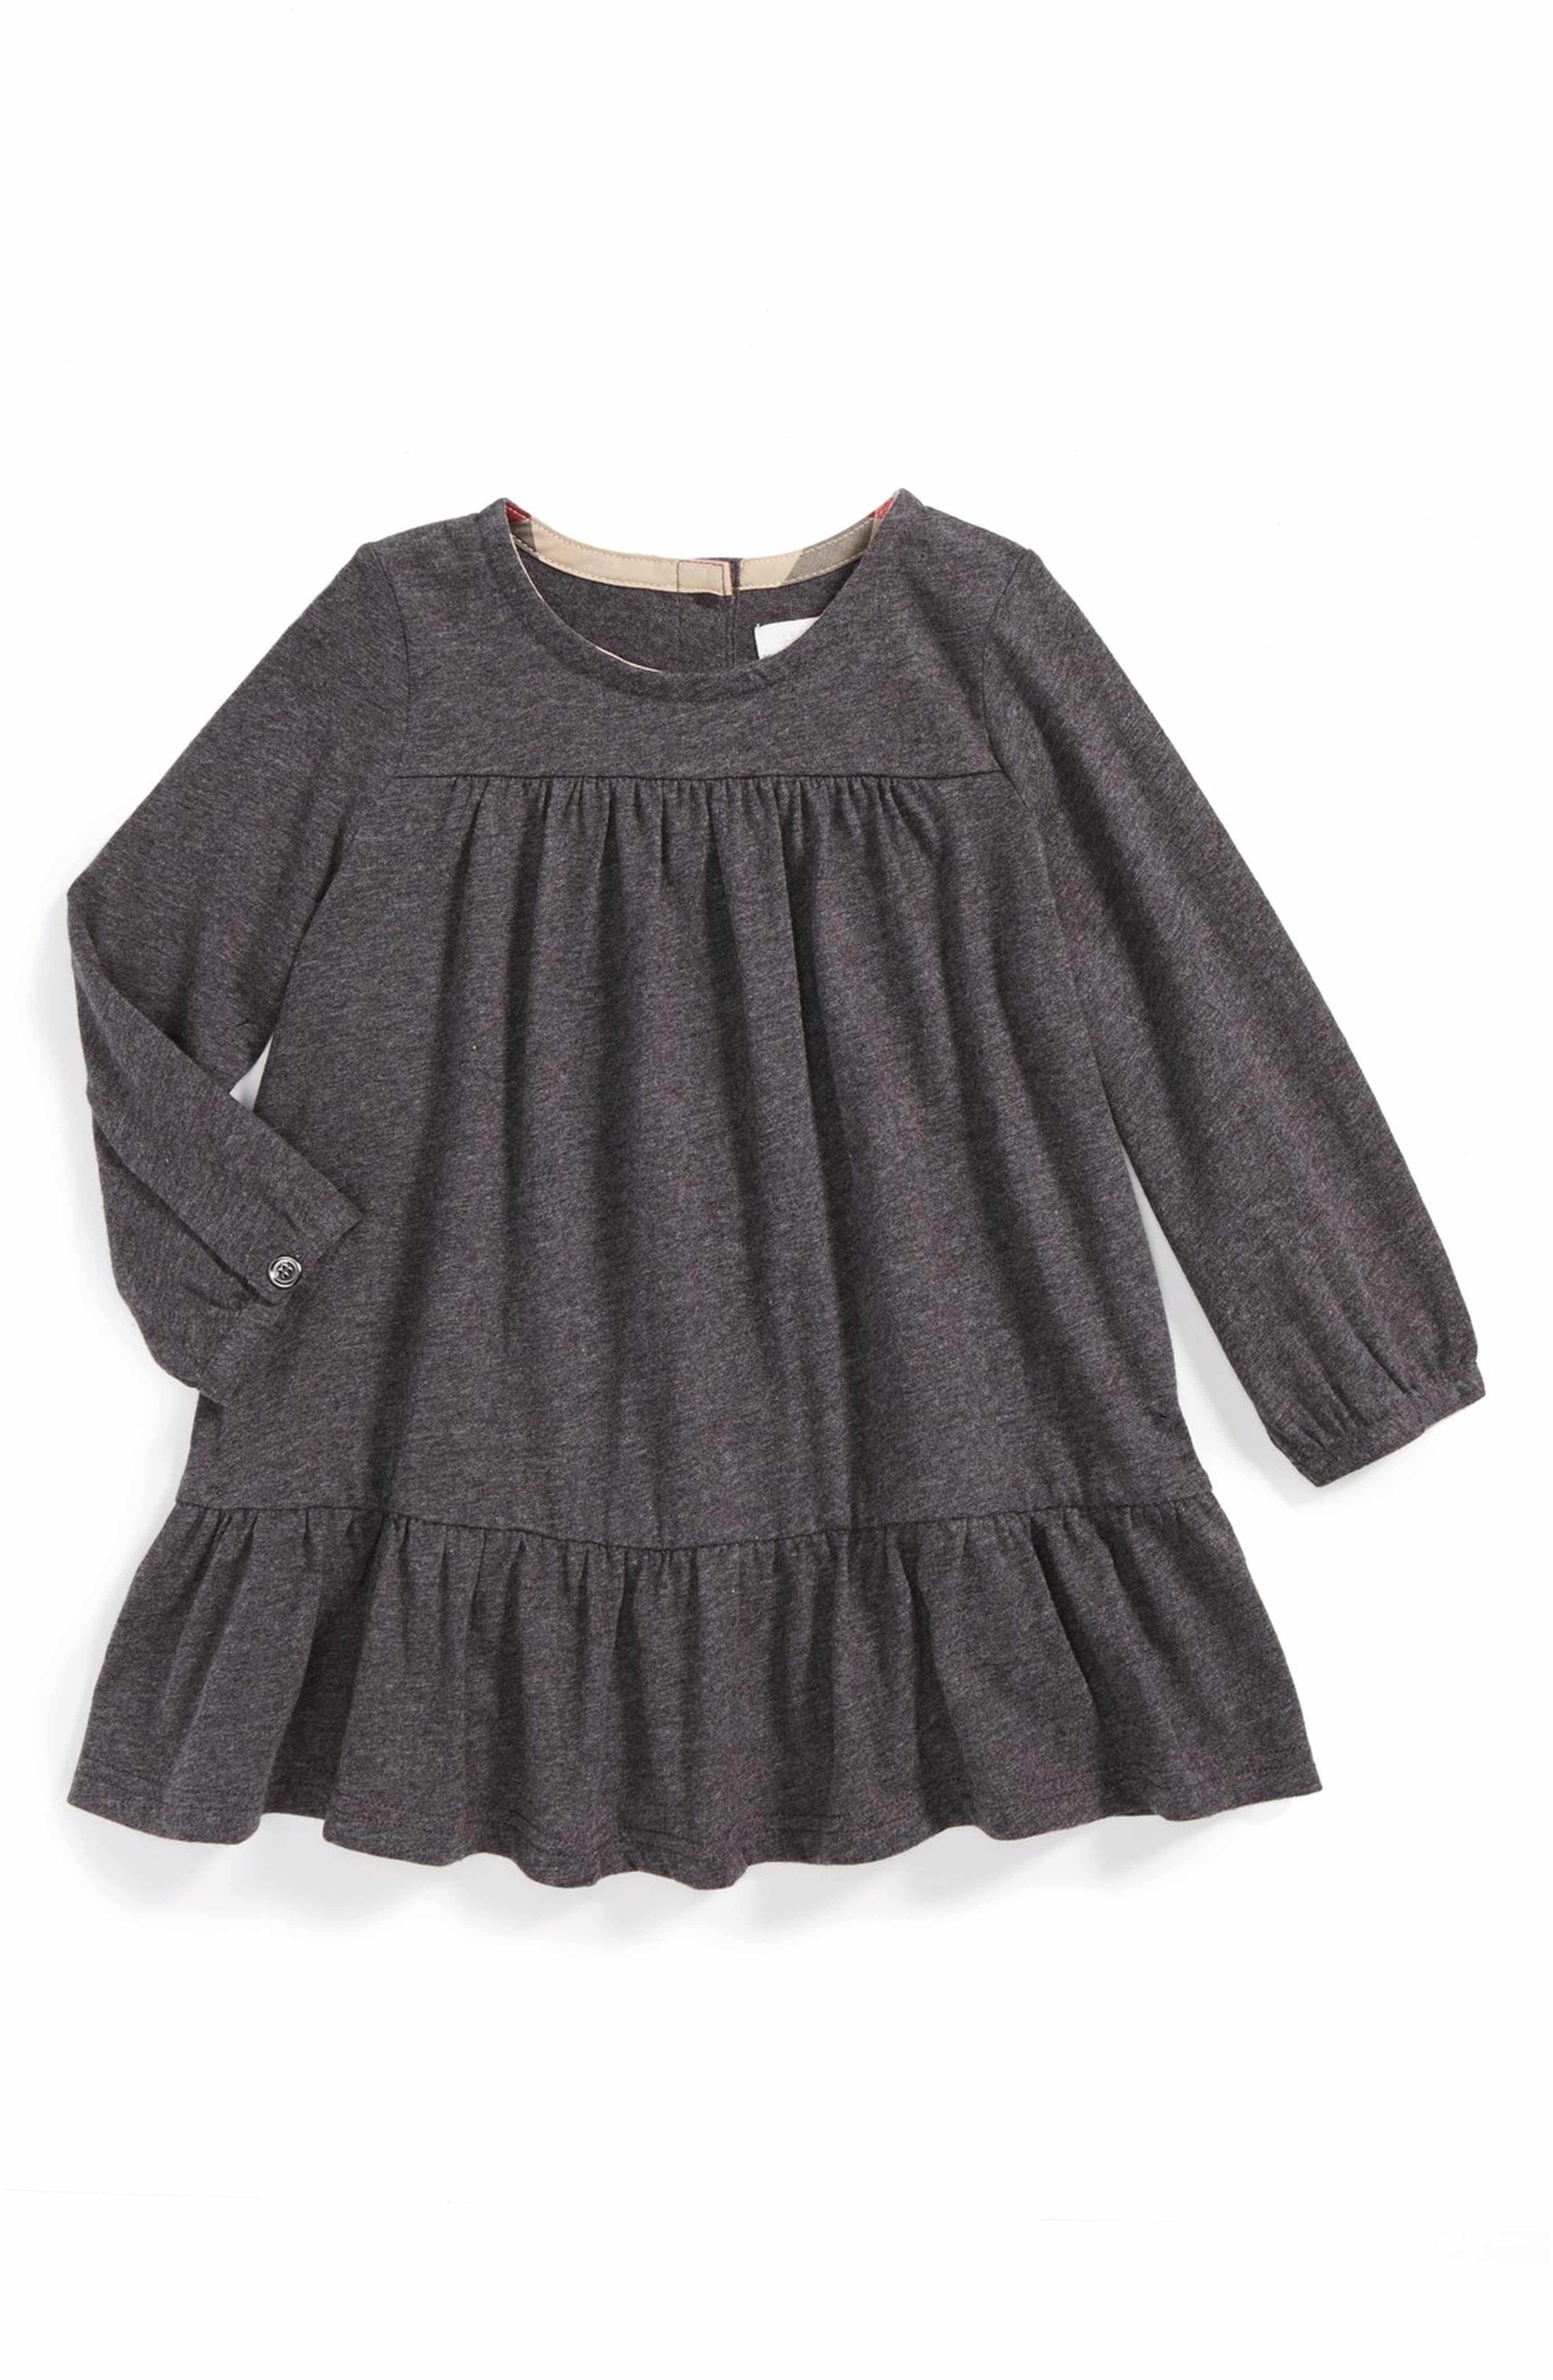 Main Image Burberry Long Sleeve Dress Baby Girls